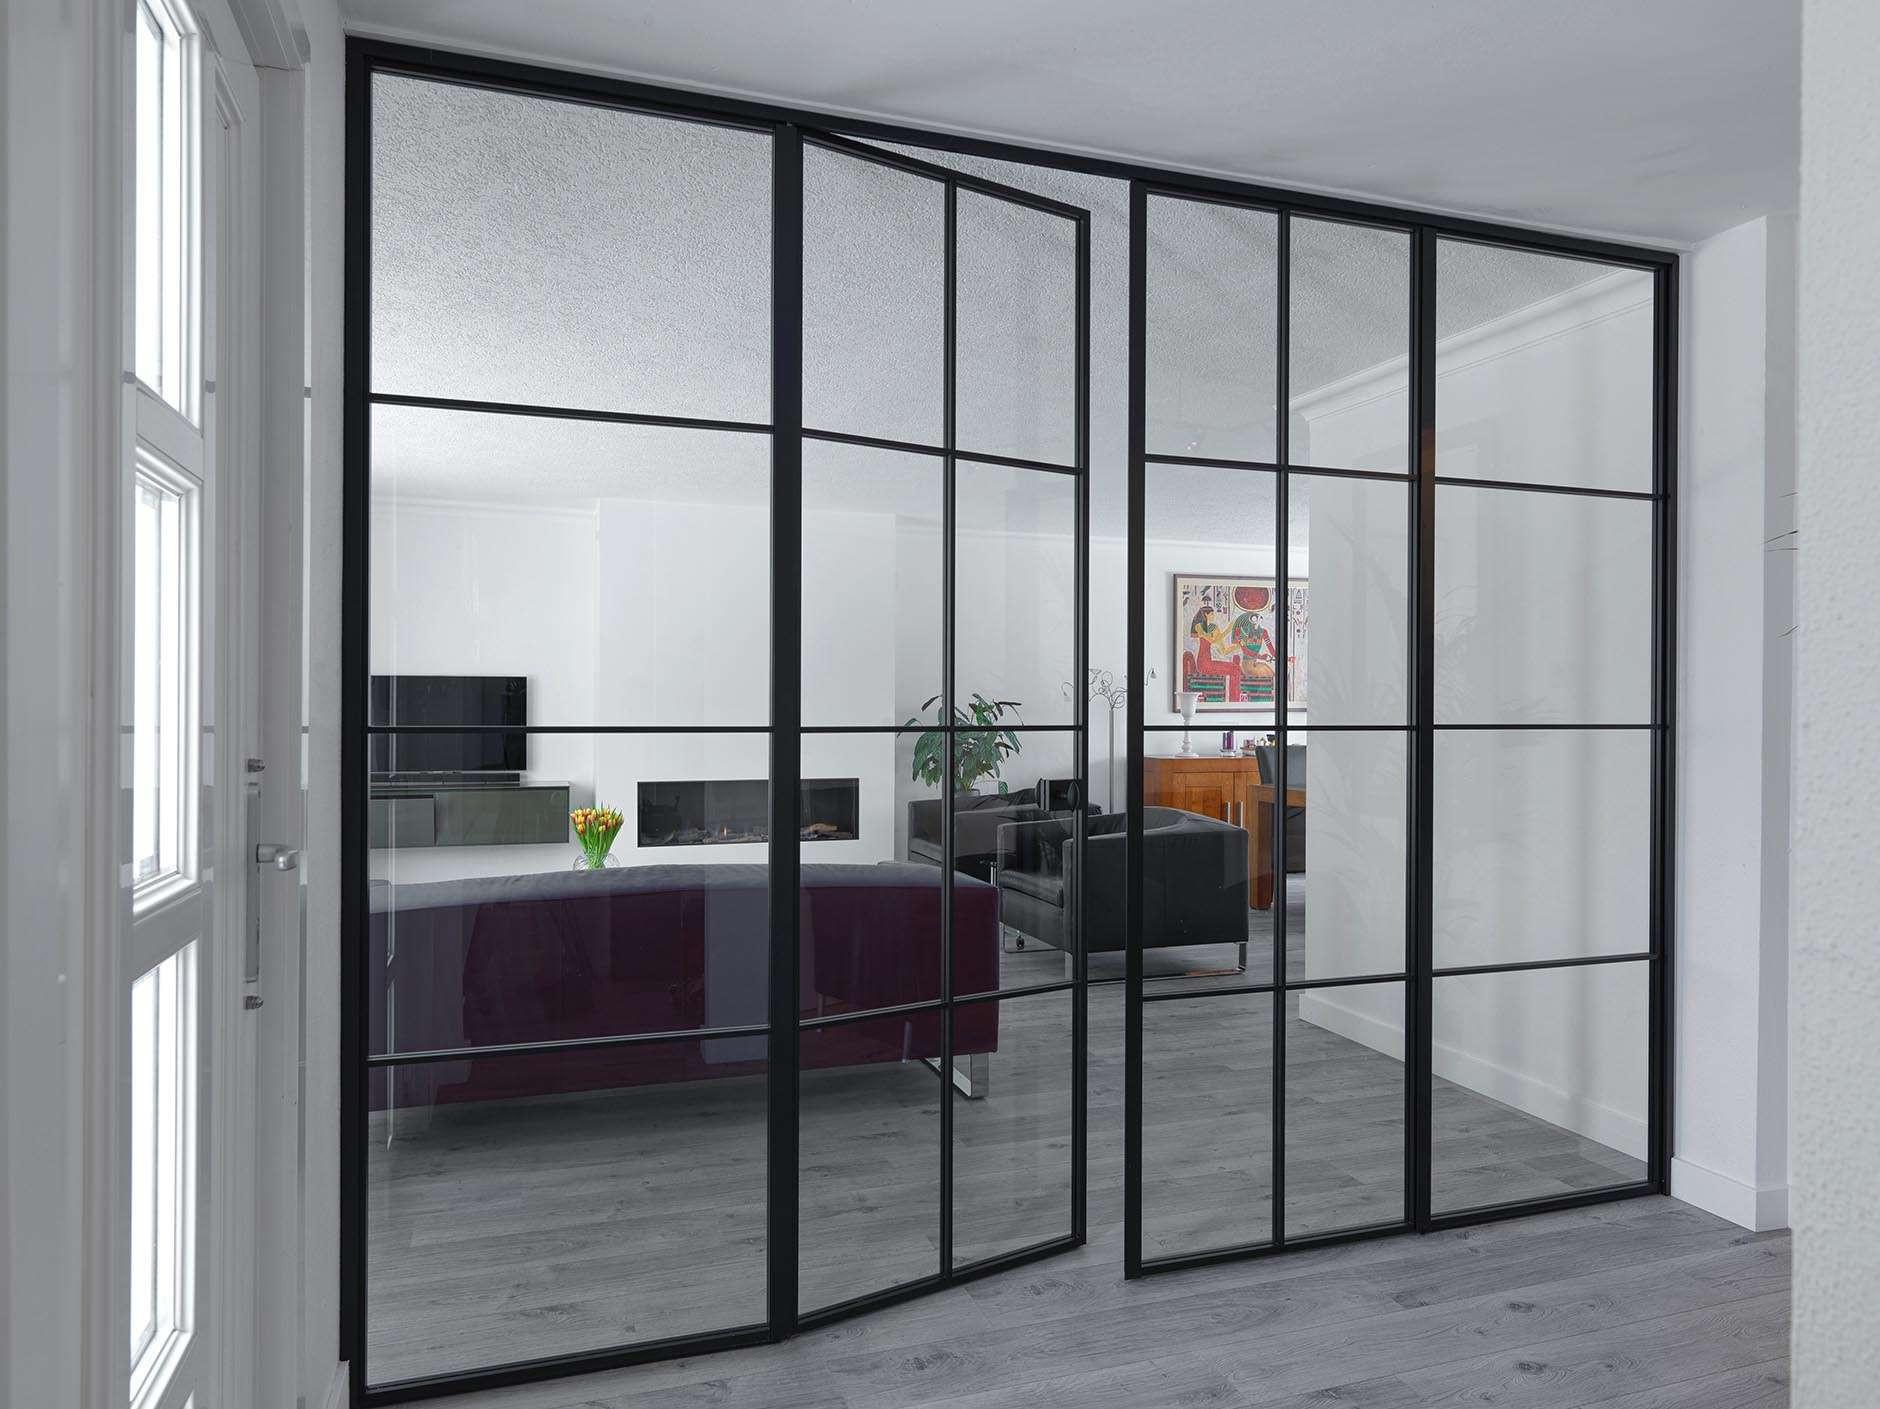 steellook-wand-dubbele-deur